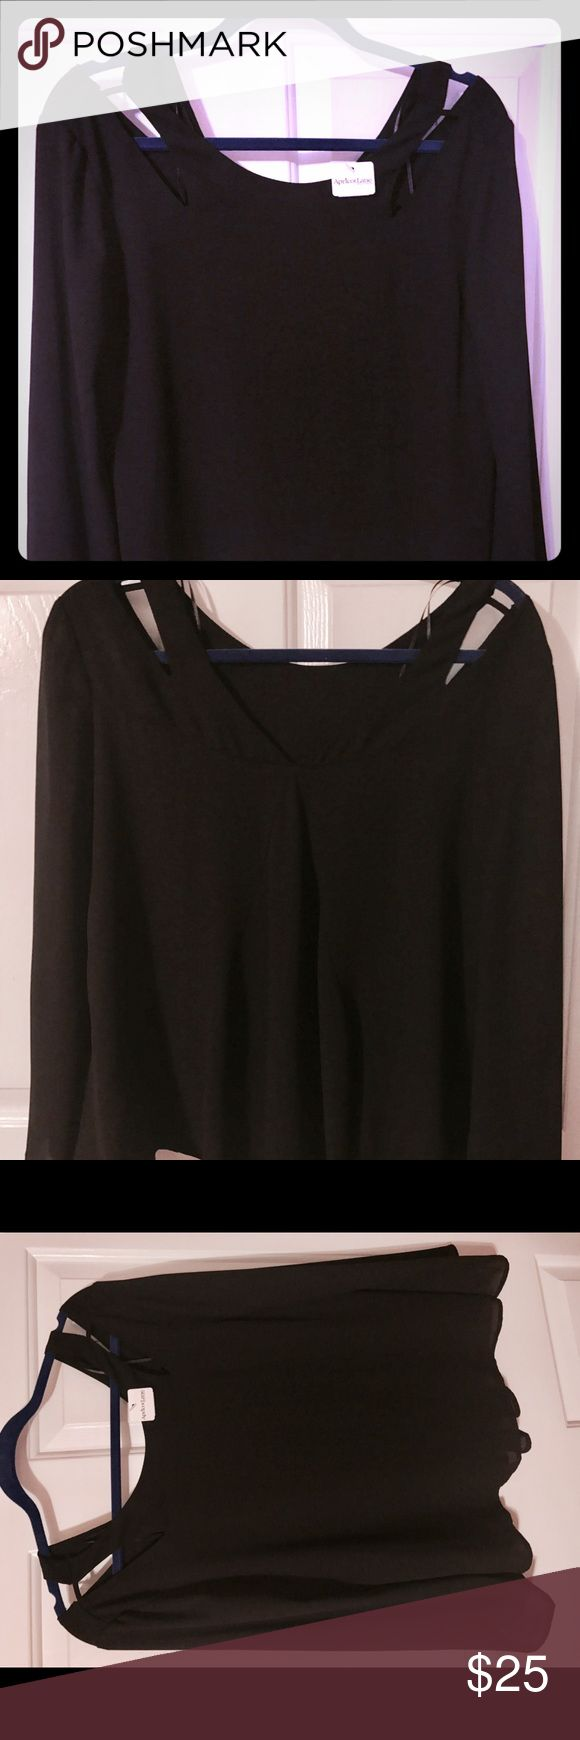 💕💕NWT Boutique Apricot Lane Blouse Black Apricot Lane blouse with cut out top design. NWT. Apricot Lane Tops Blouses